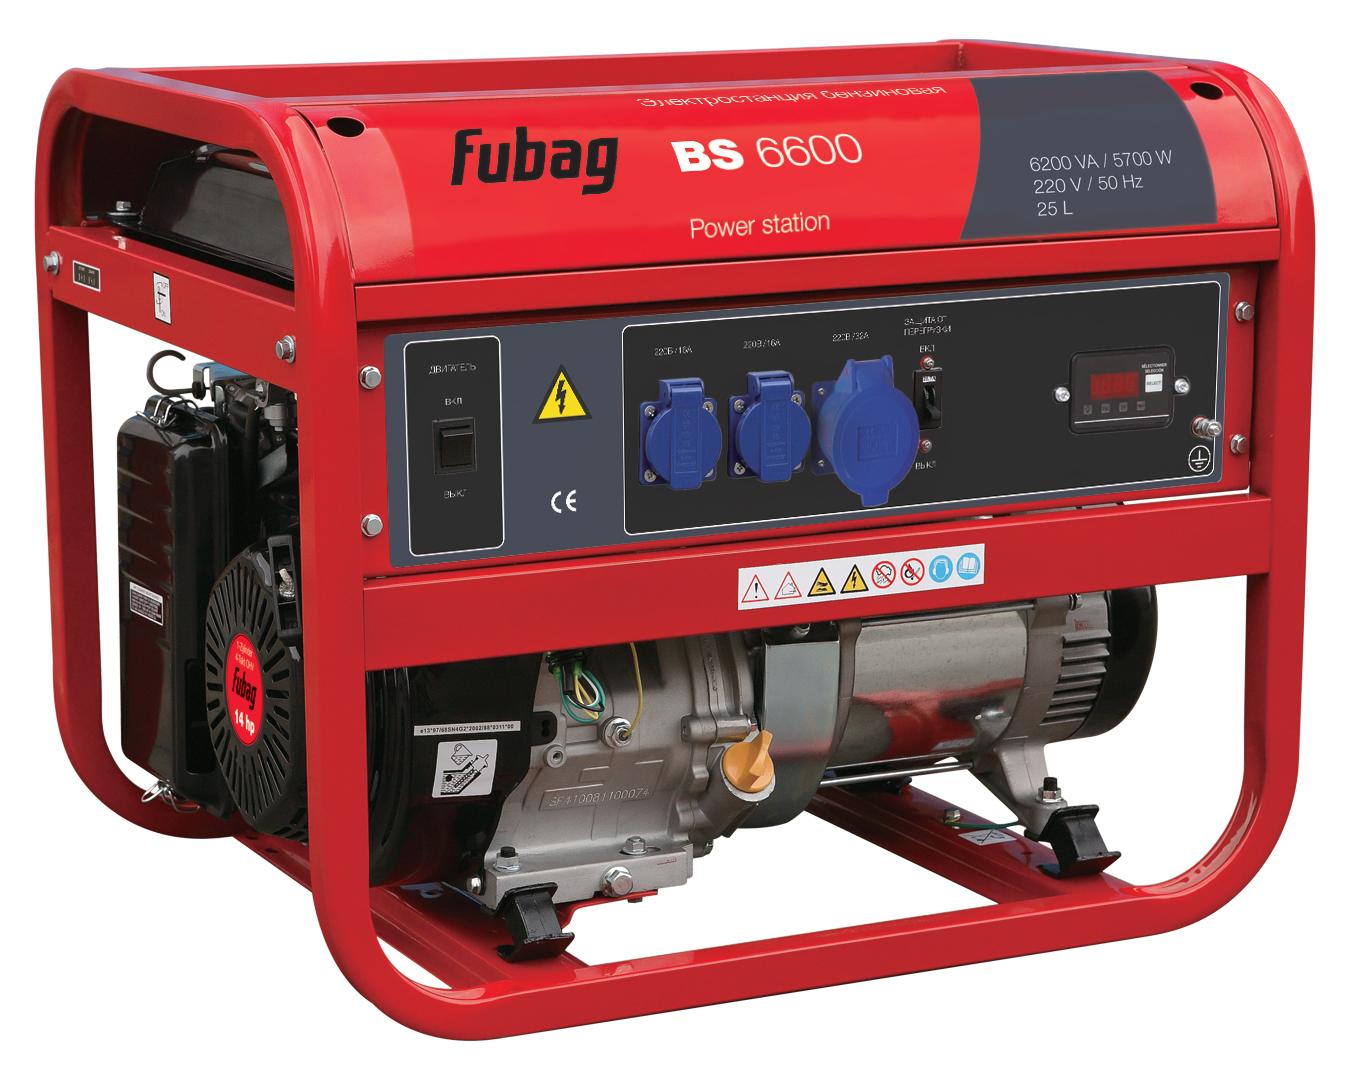 Fubag 6600